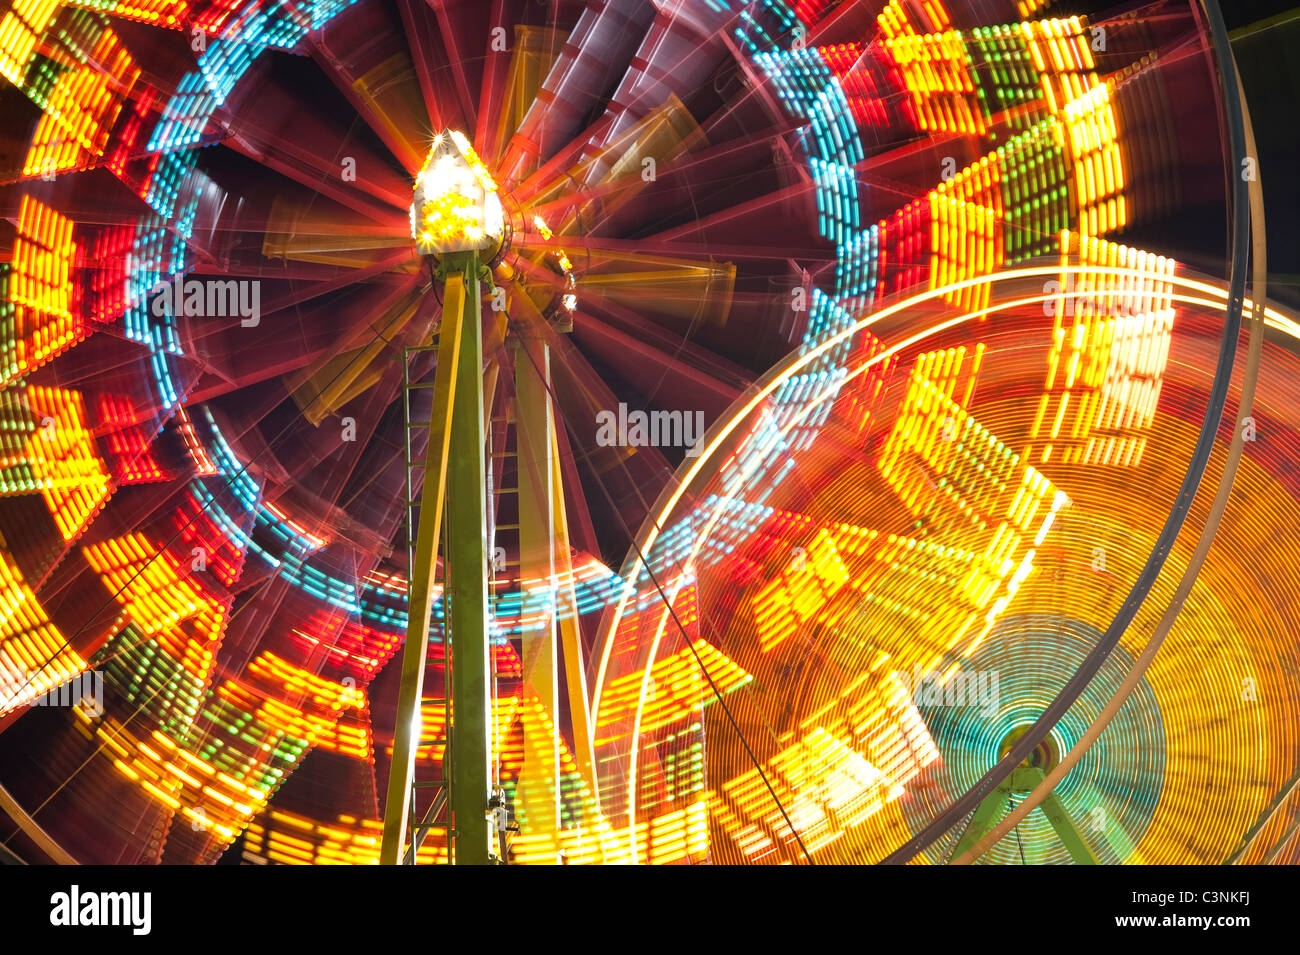 Ferris wheel in motion close up of light streaks Evergreen State Fair Monroe Washington State USA - Stock Image